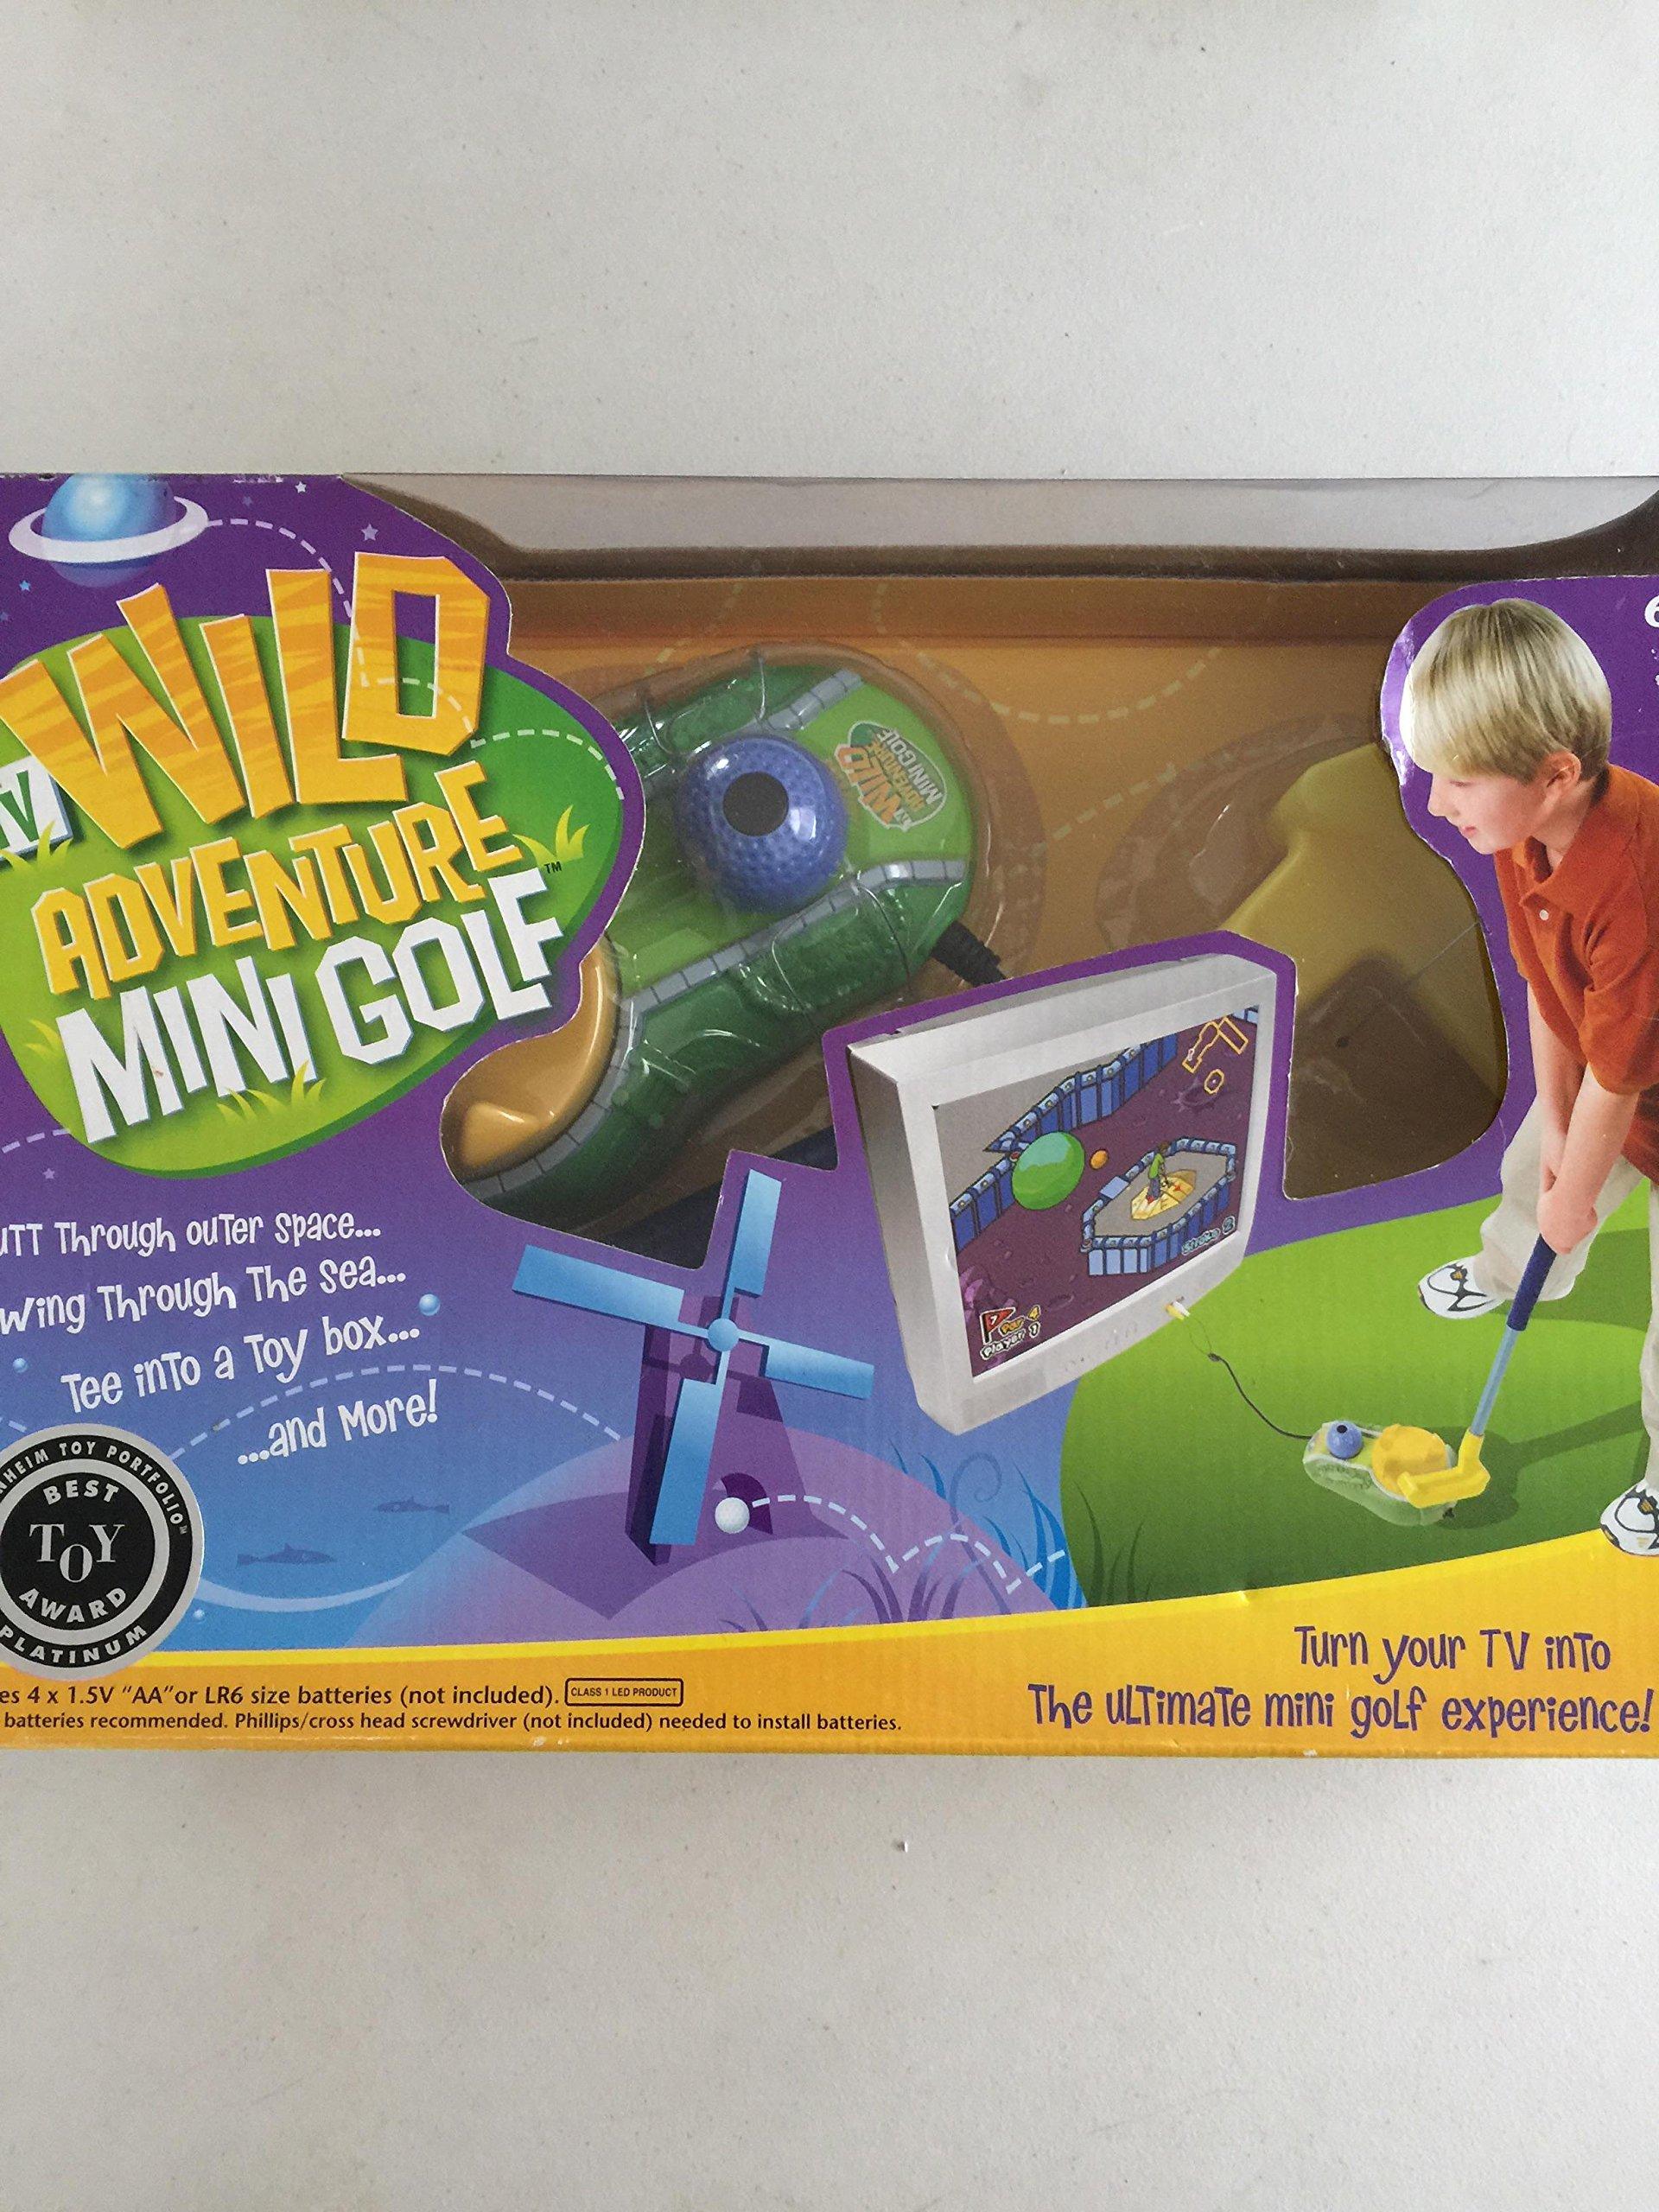 Plug & Play Tv Games Wild Adventure Mini Golf by Bradley (Image #1)